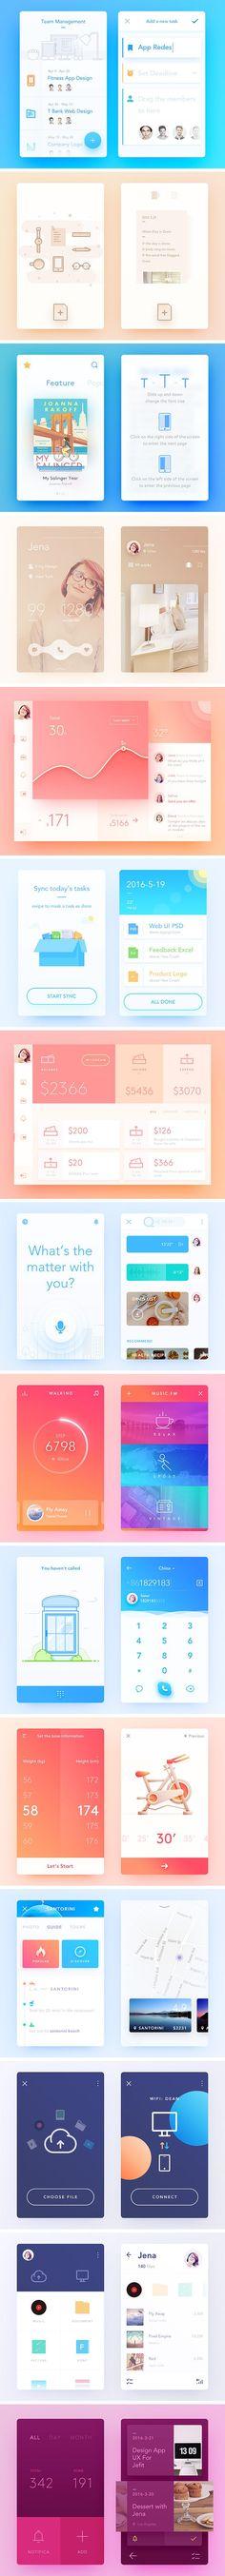 Inspirational UI Elements vol. 3 — download free ui kits by PixelBuddha